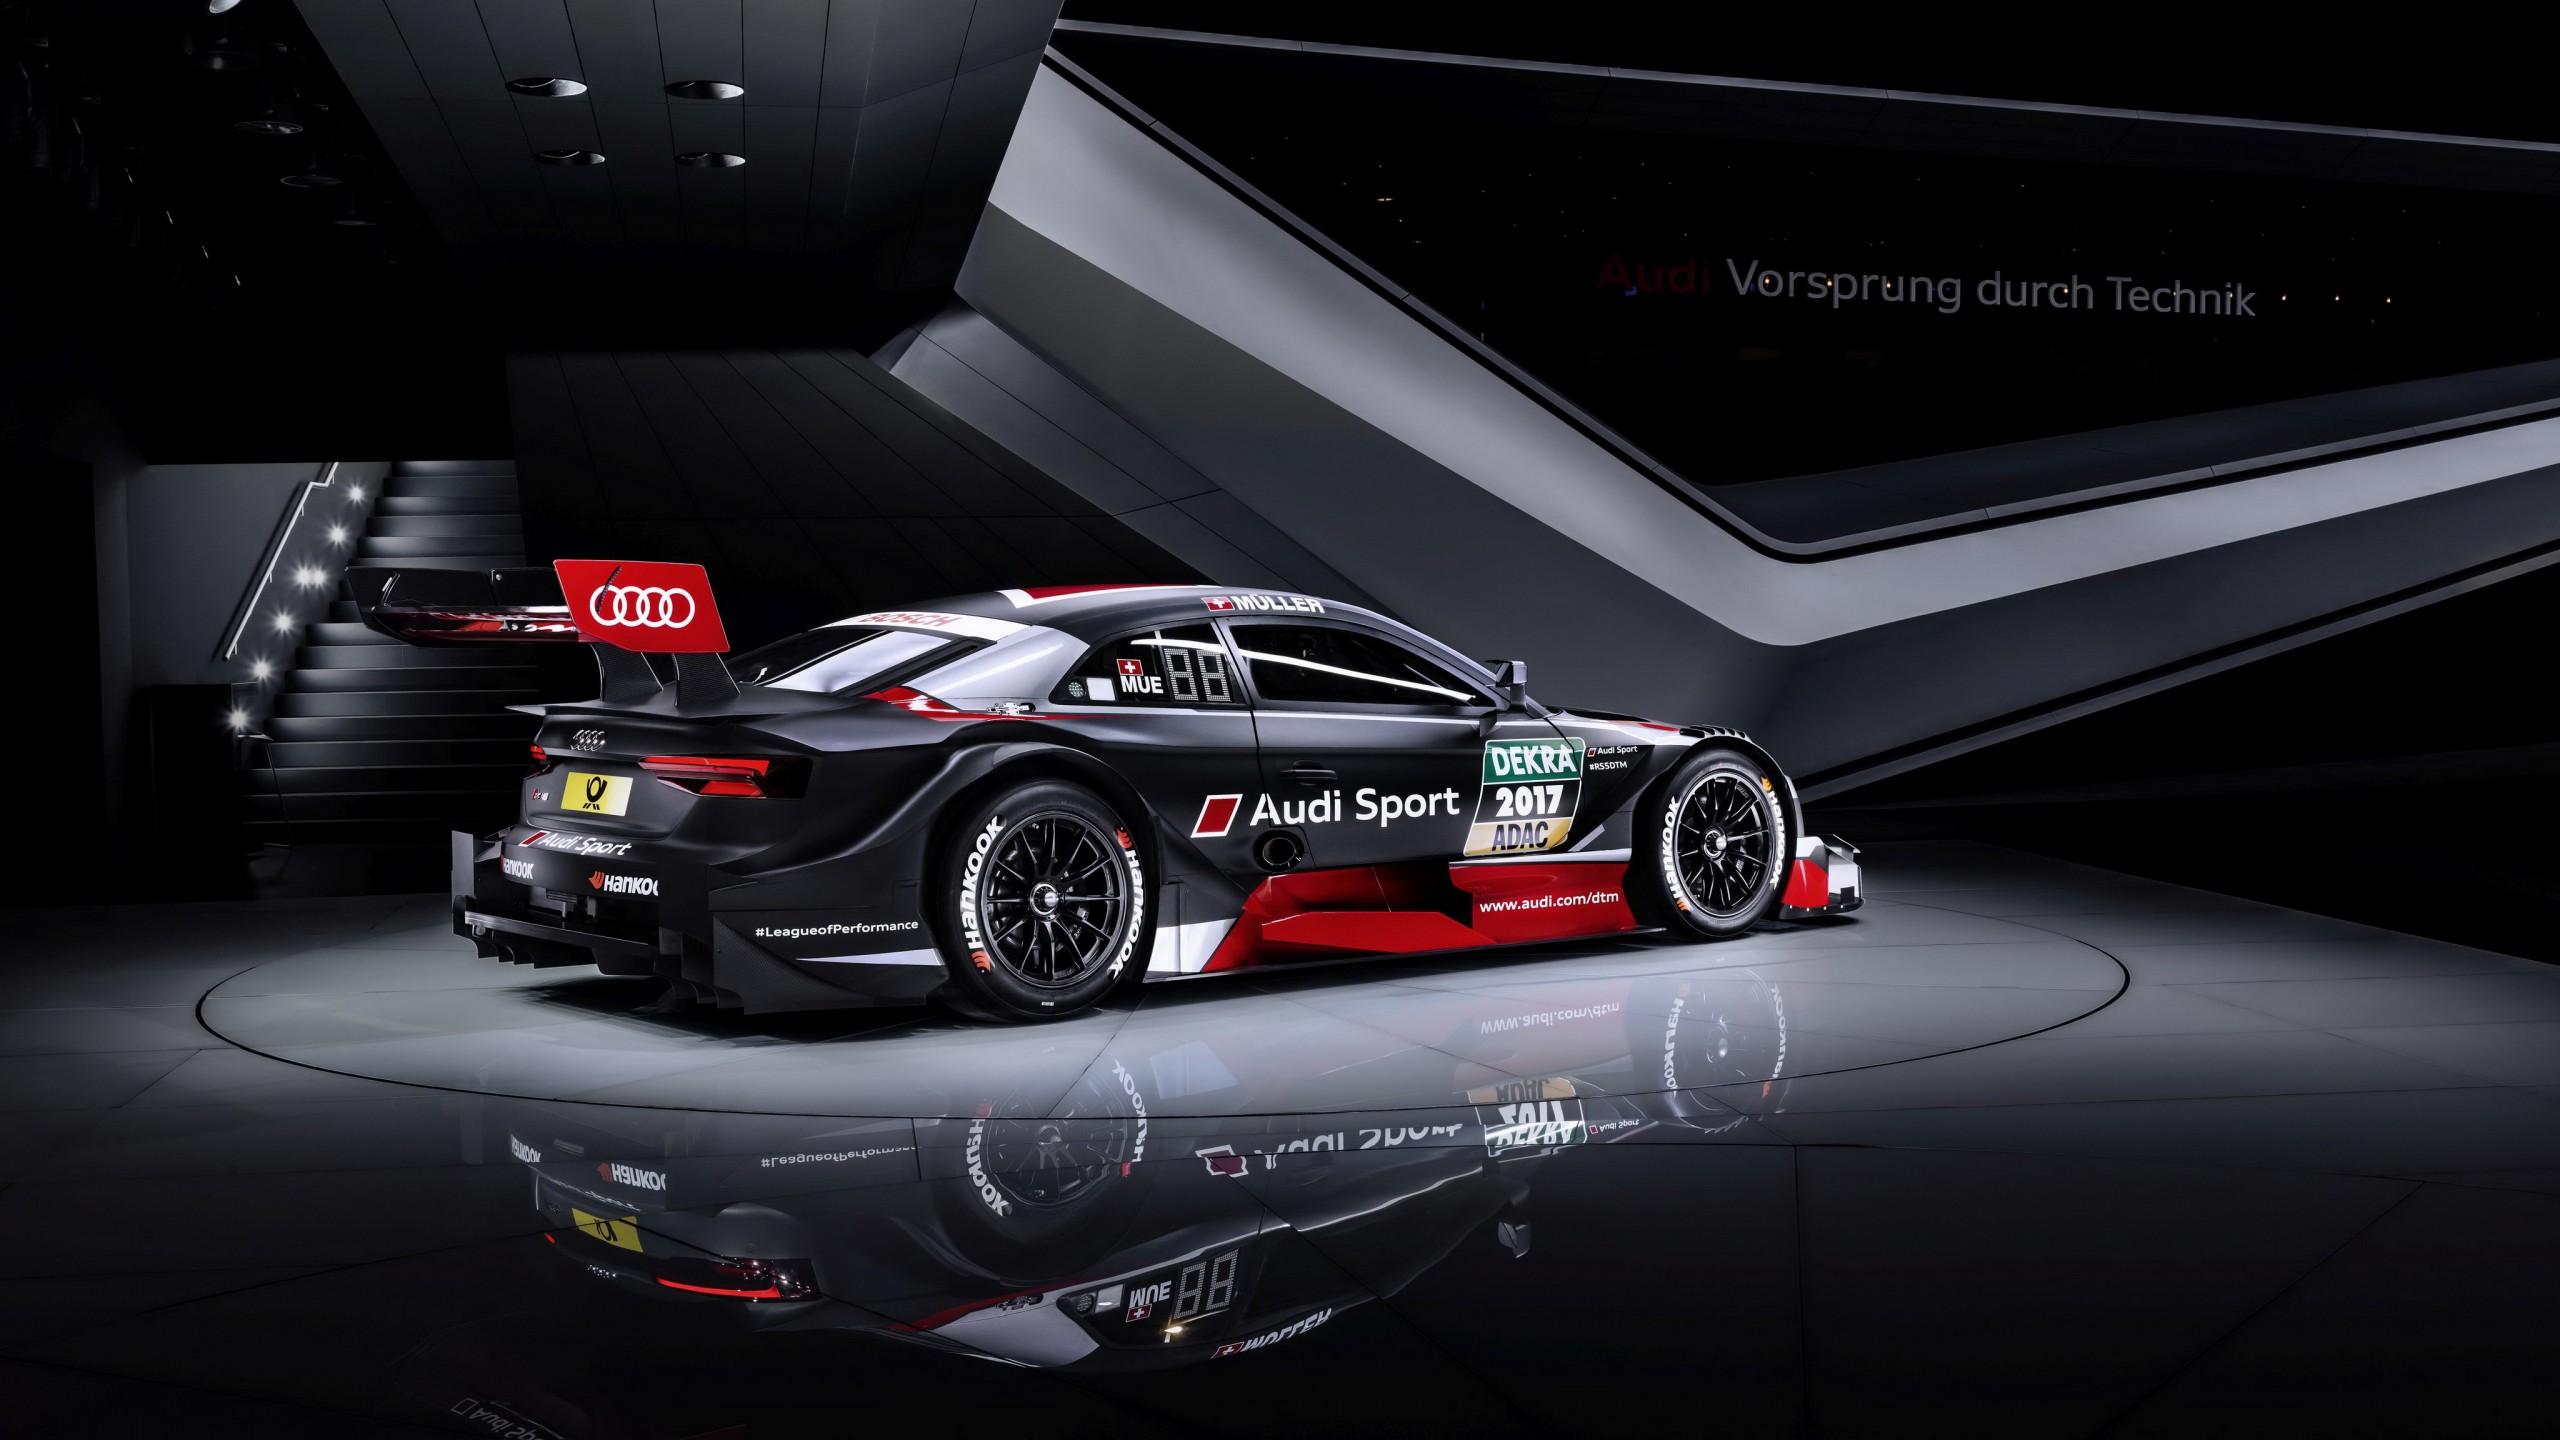 Jaguar Car Logo Hd Wallpaper Download 2018 Audi Rs 5 Coupe Dtm 2 Wallpaper Hd Car Wallpapers